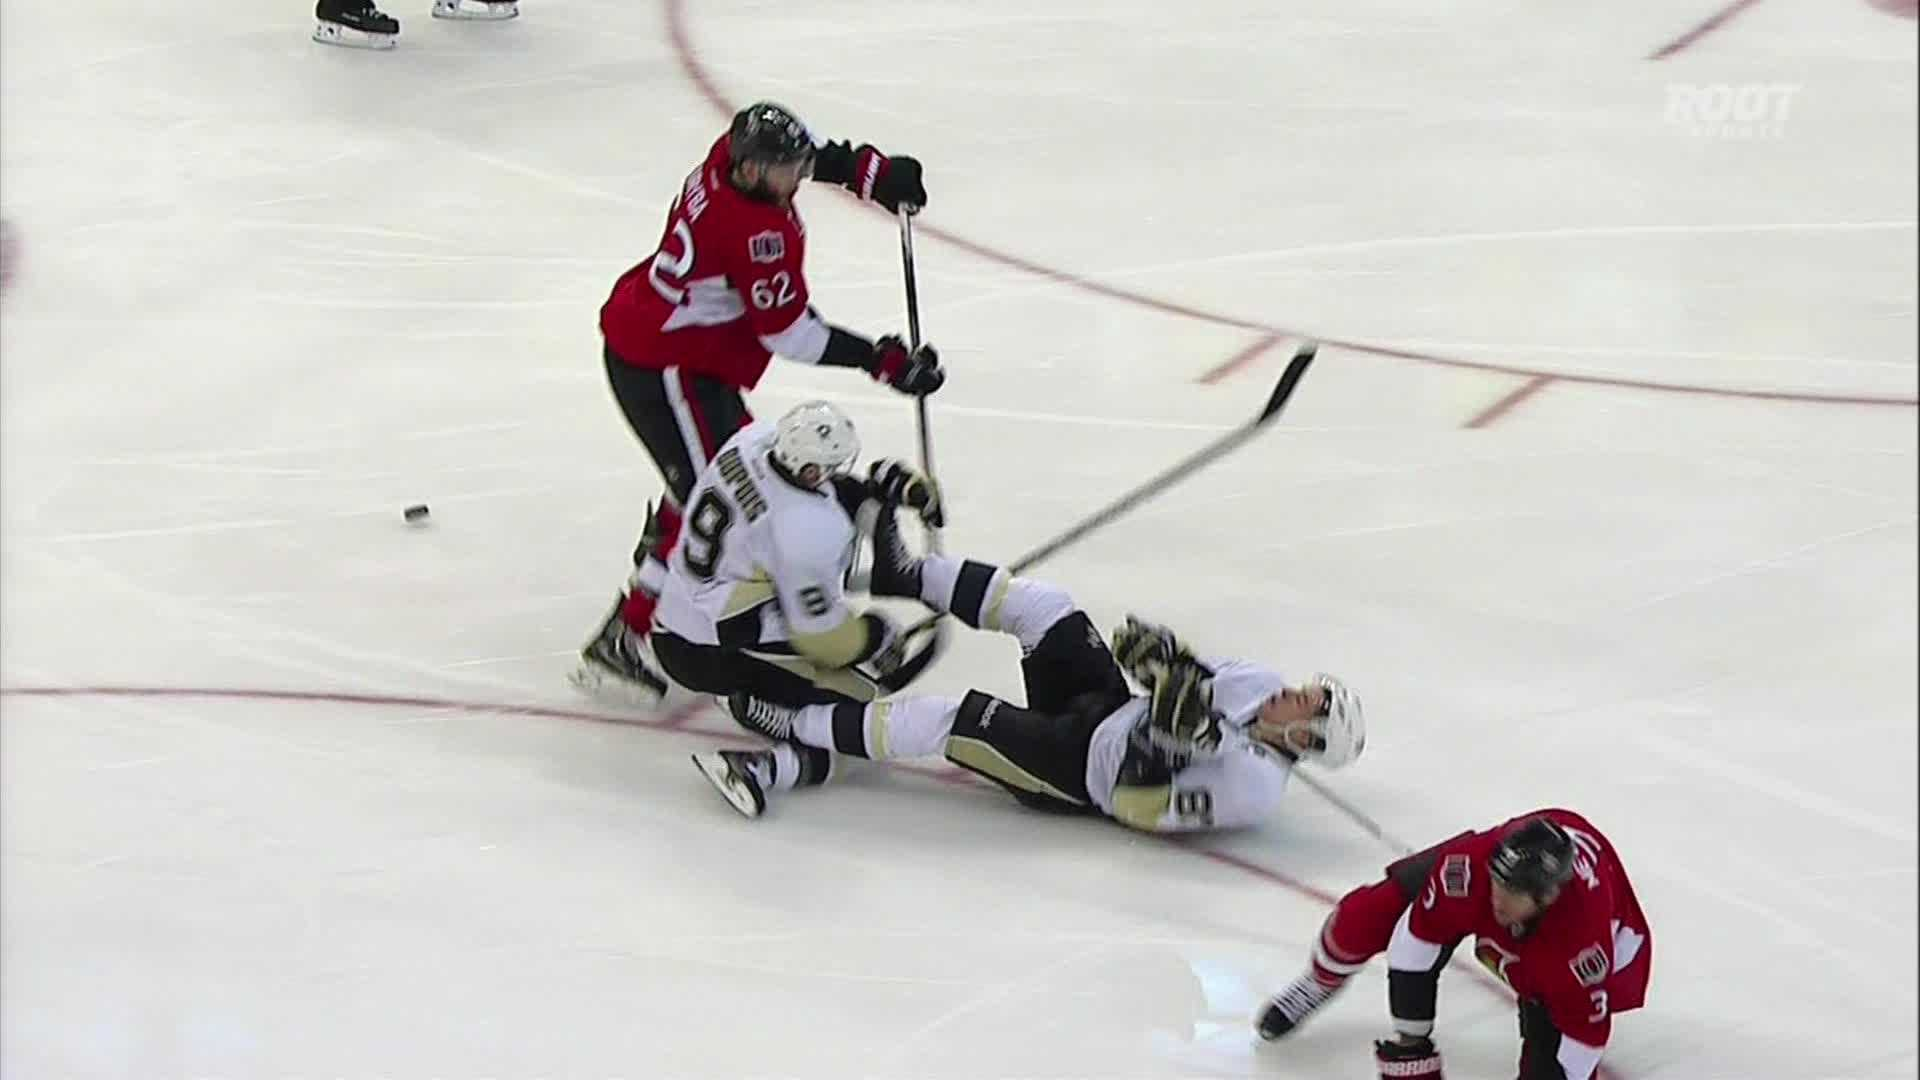 img-Pascal Dupuis injured